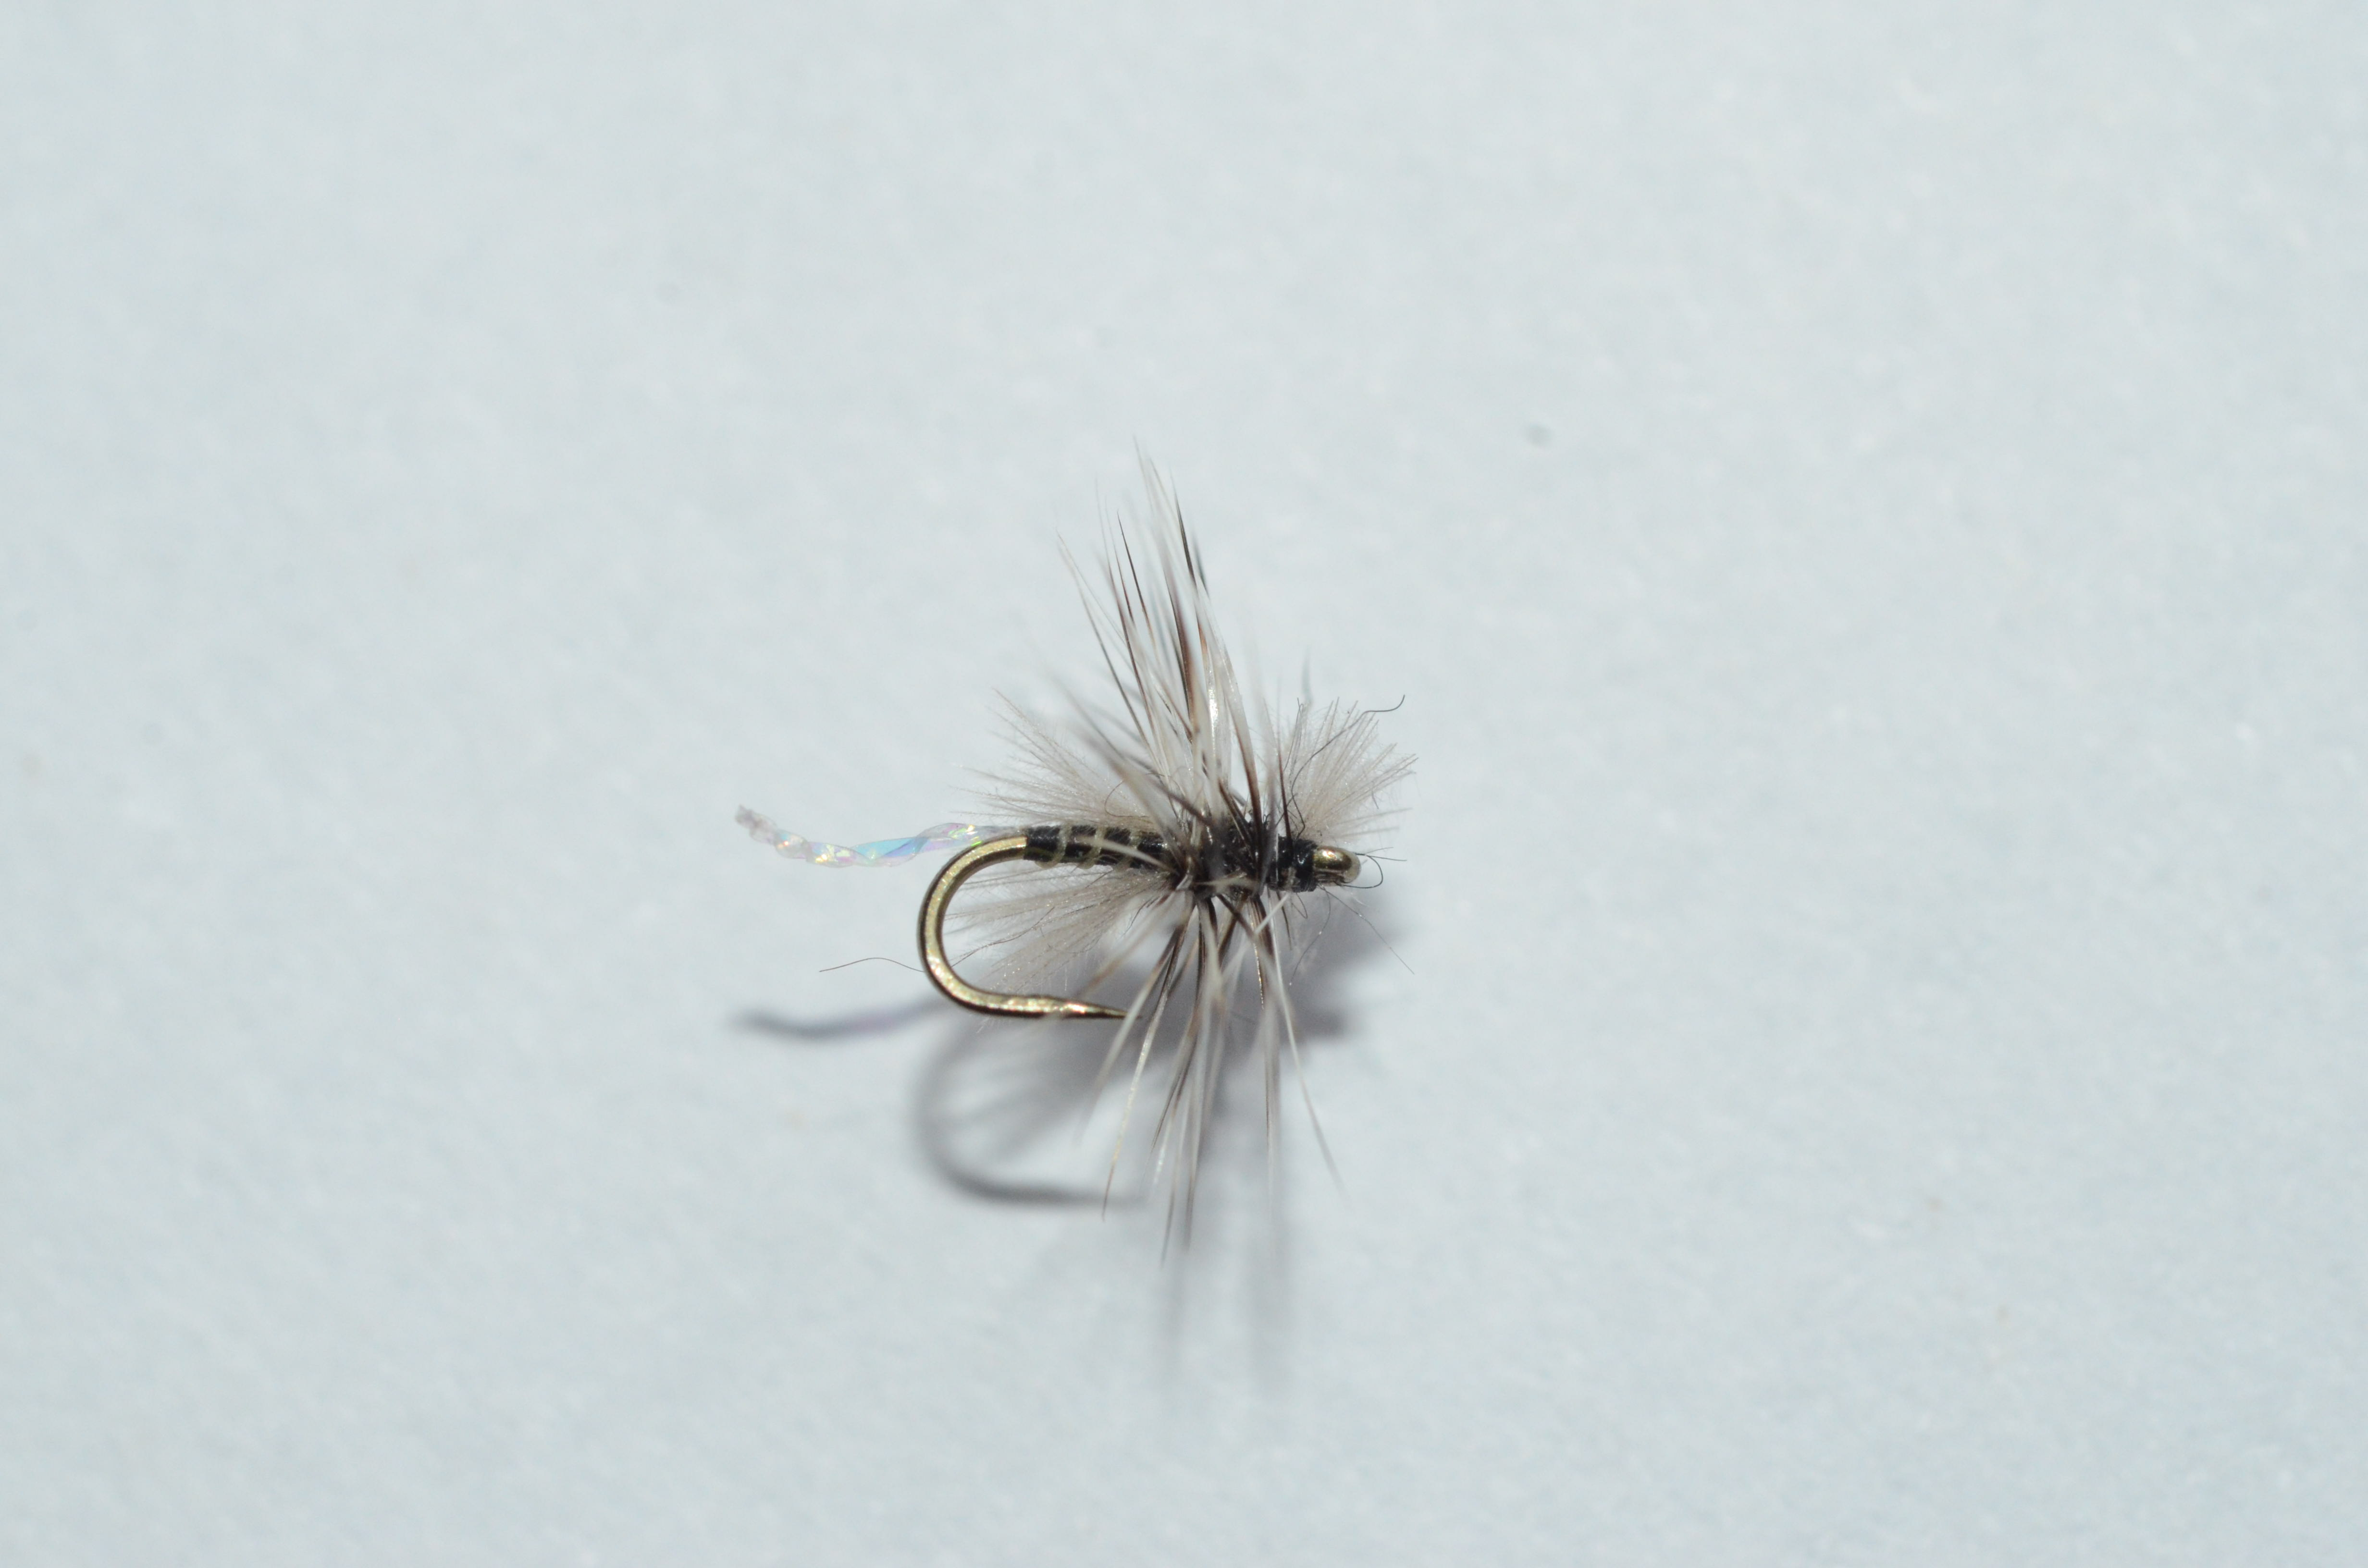 6 WOOLLY BUGGER FISHING FLIES~ Size 6 ~ Six 3 Black Flies ~ 3 Olive